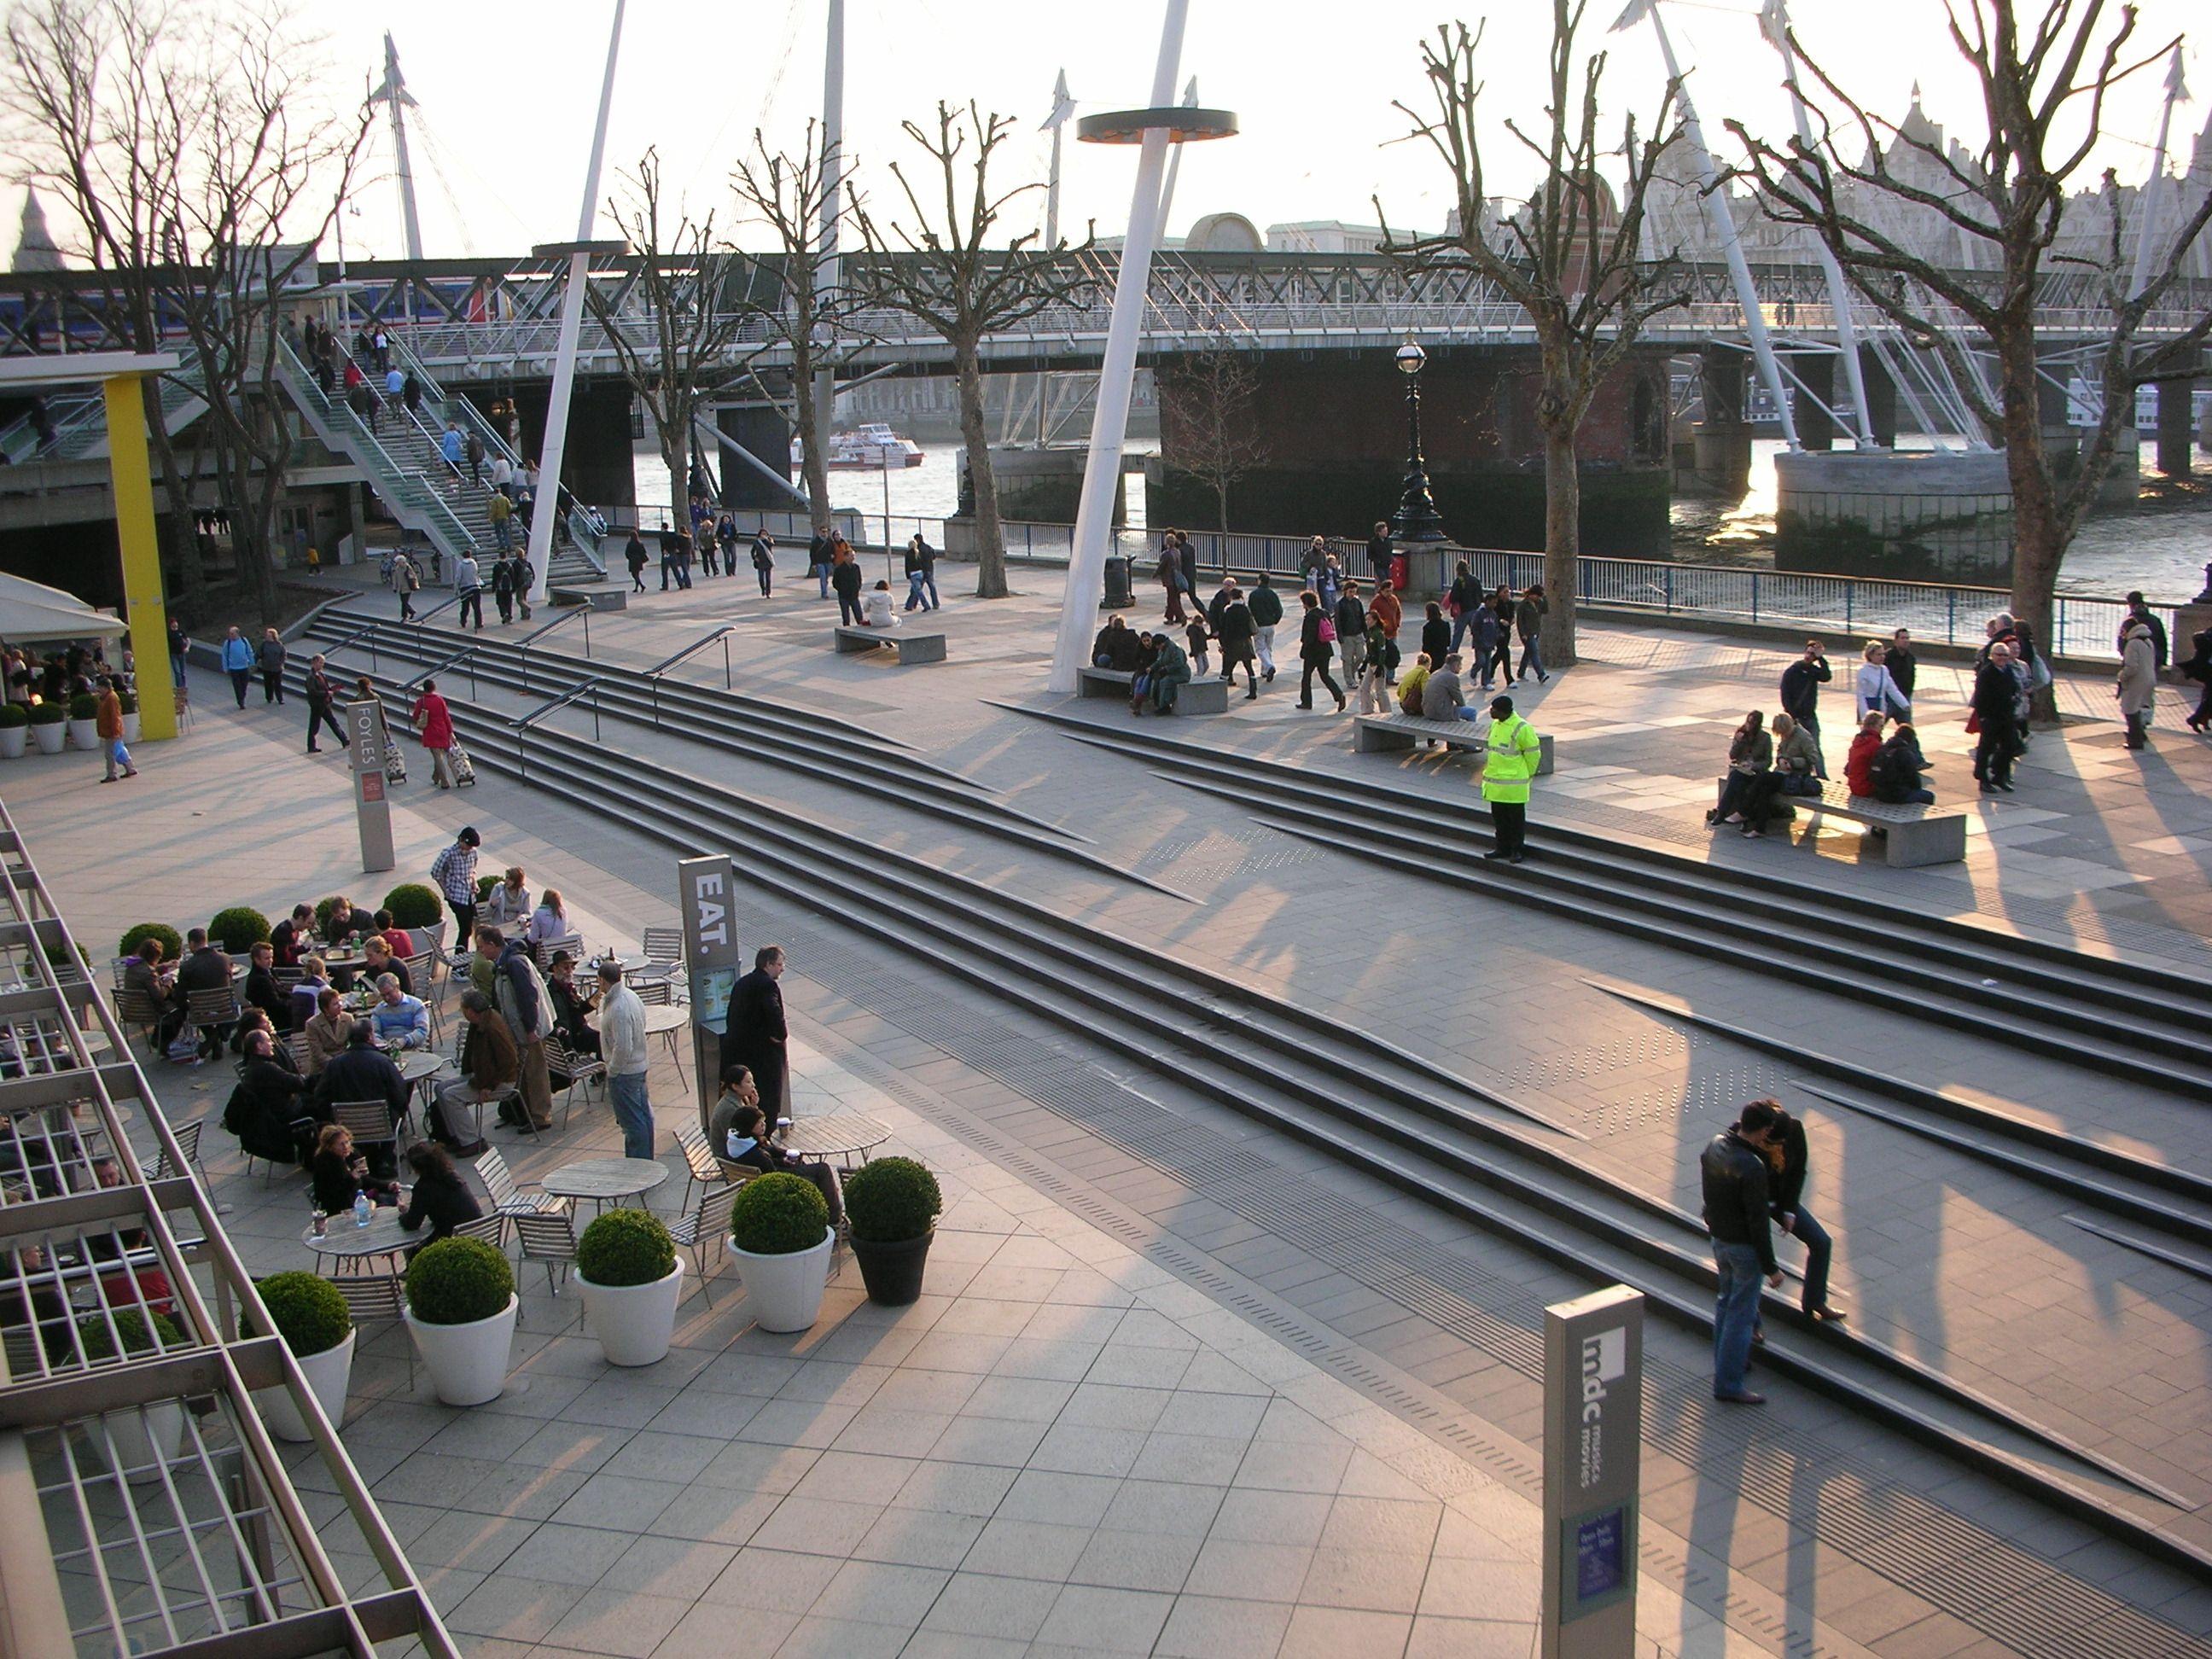 Landscapes along the south bank - Southbank Royal Festival Hall Landscape Steps And Ramp